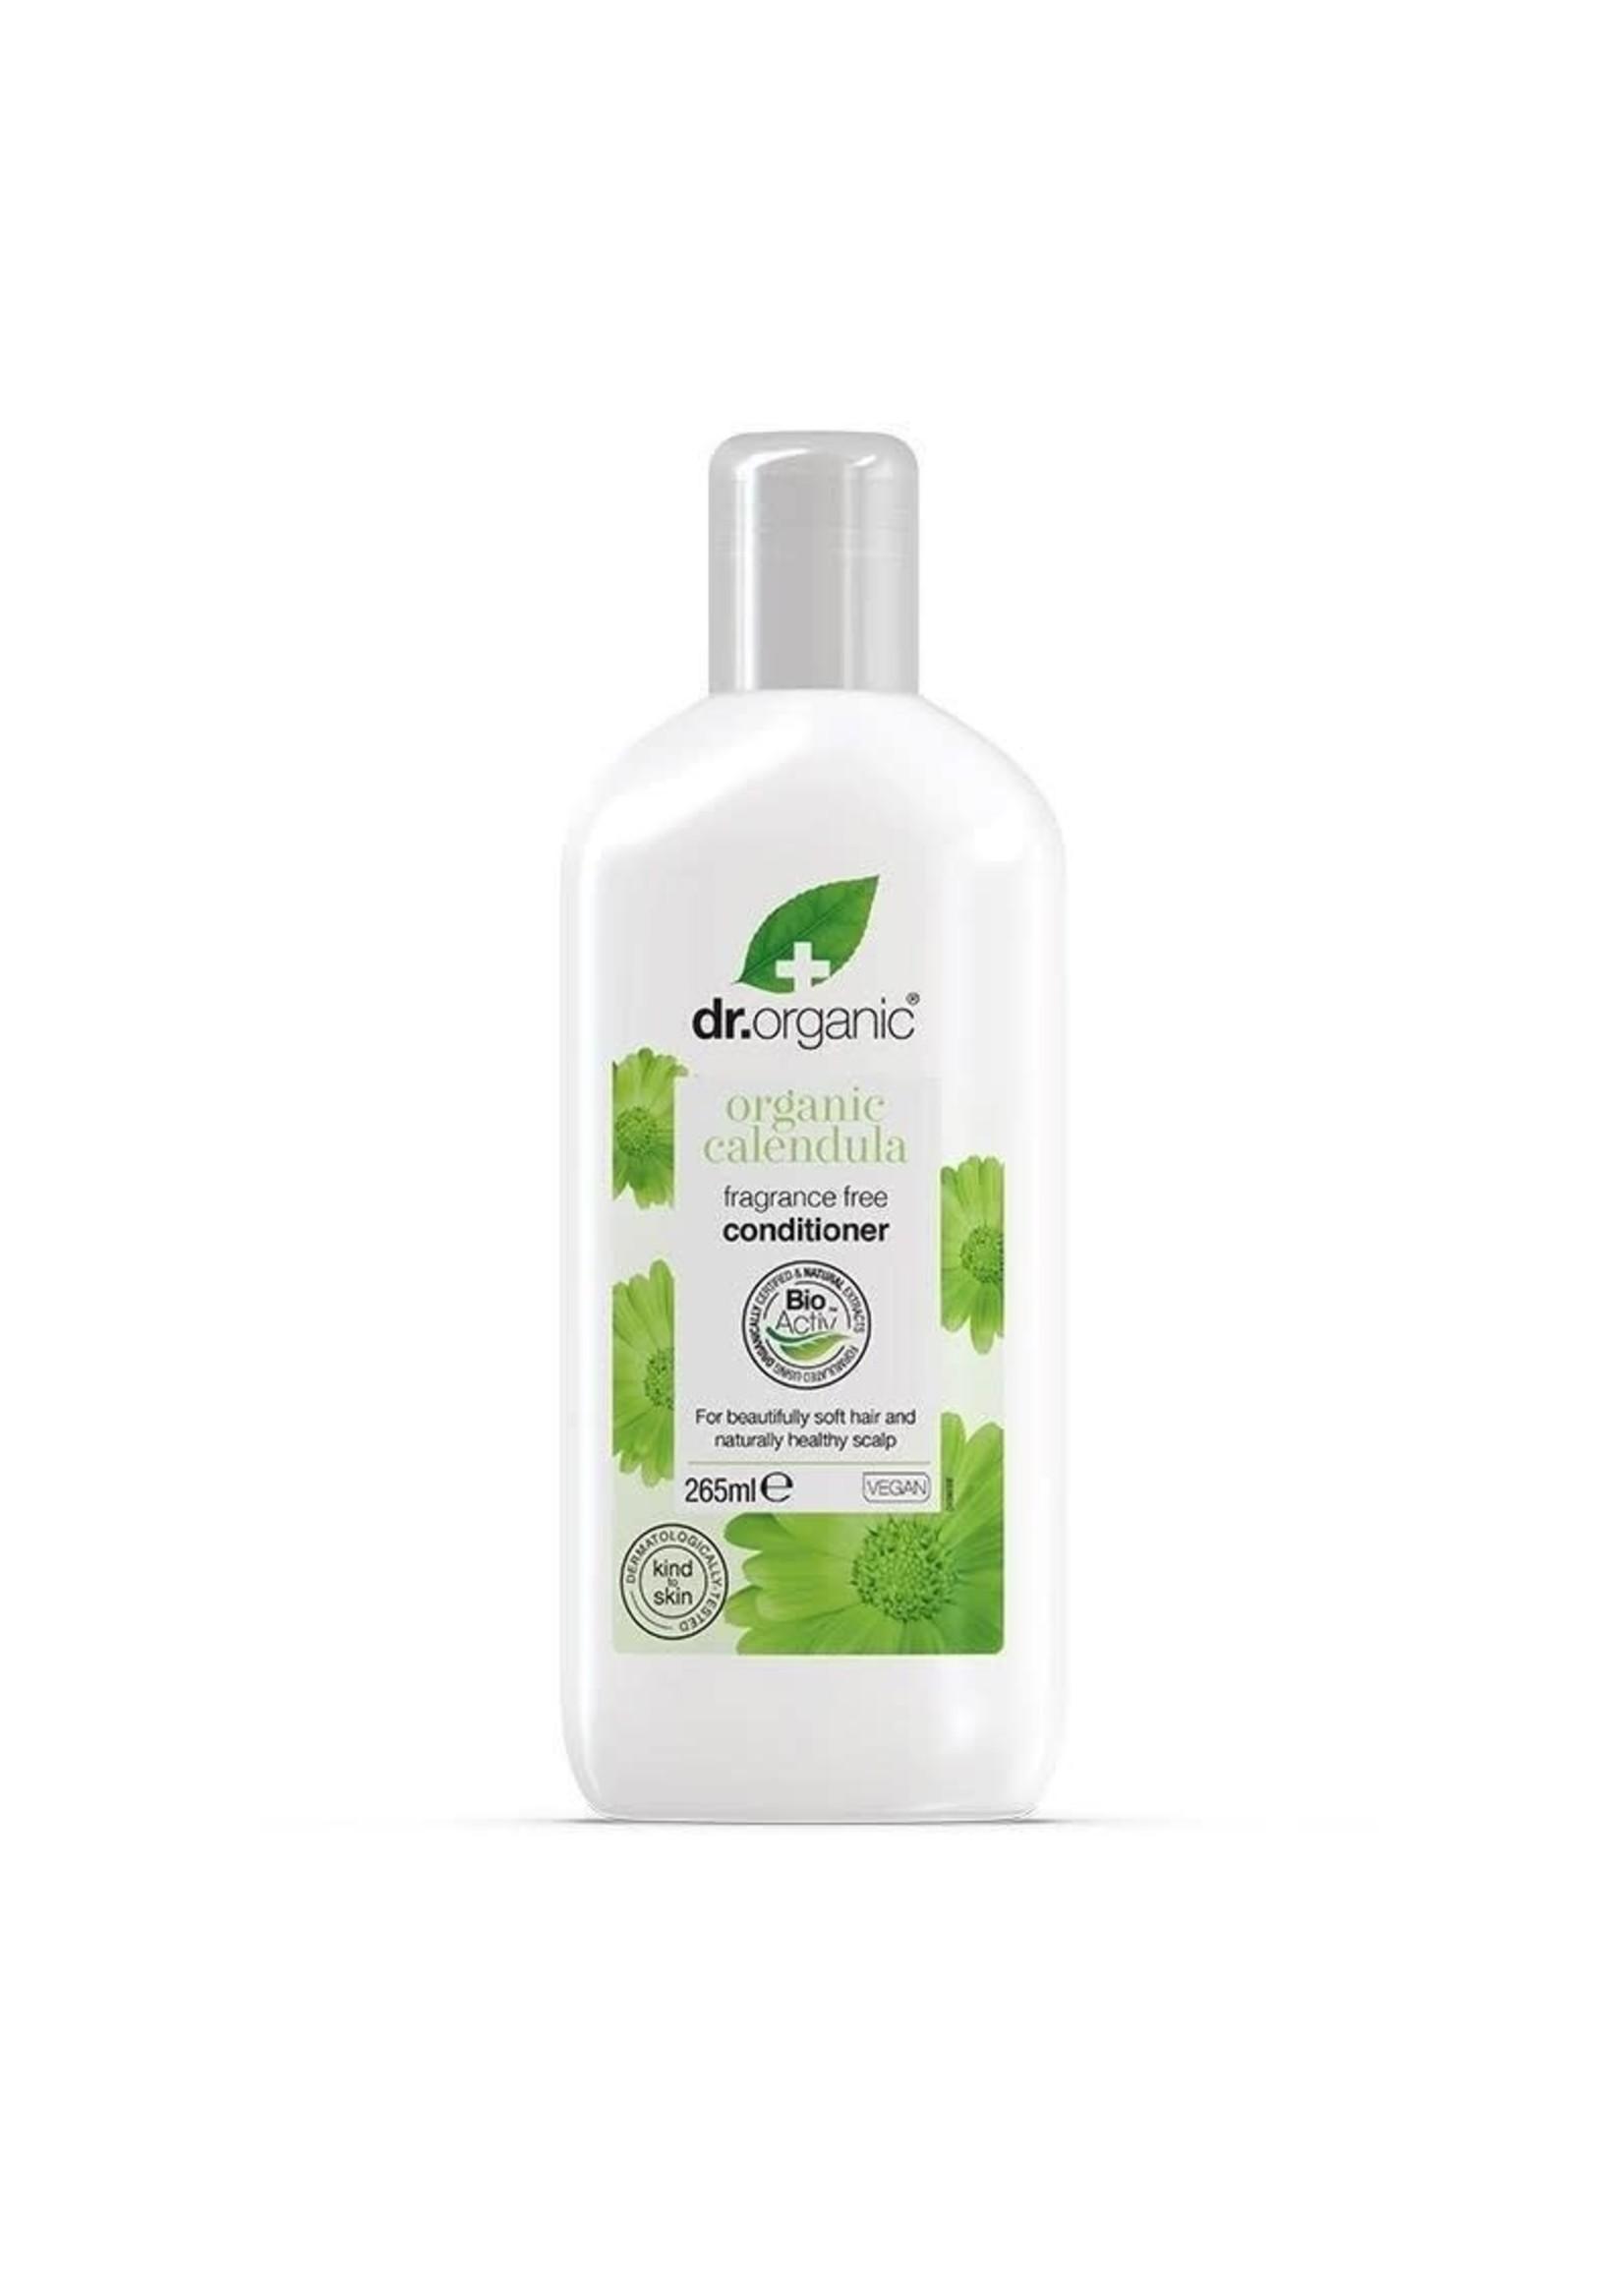 Dr Organic Dr Organic Calendula Fragrance Free Conditioner  265 ml